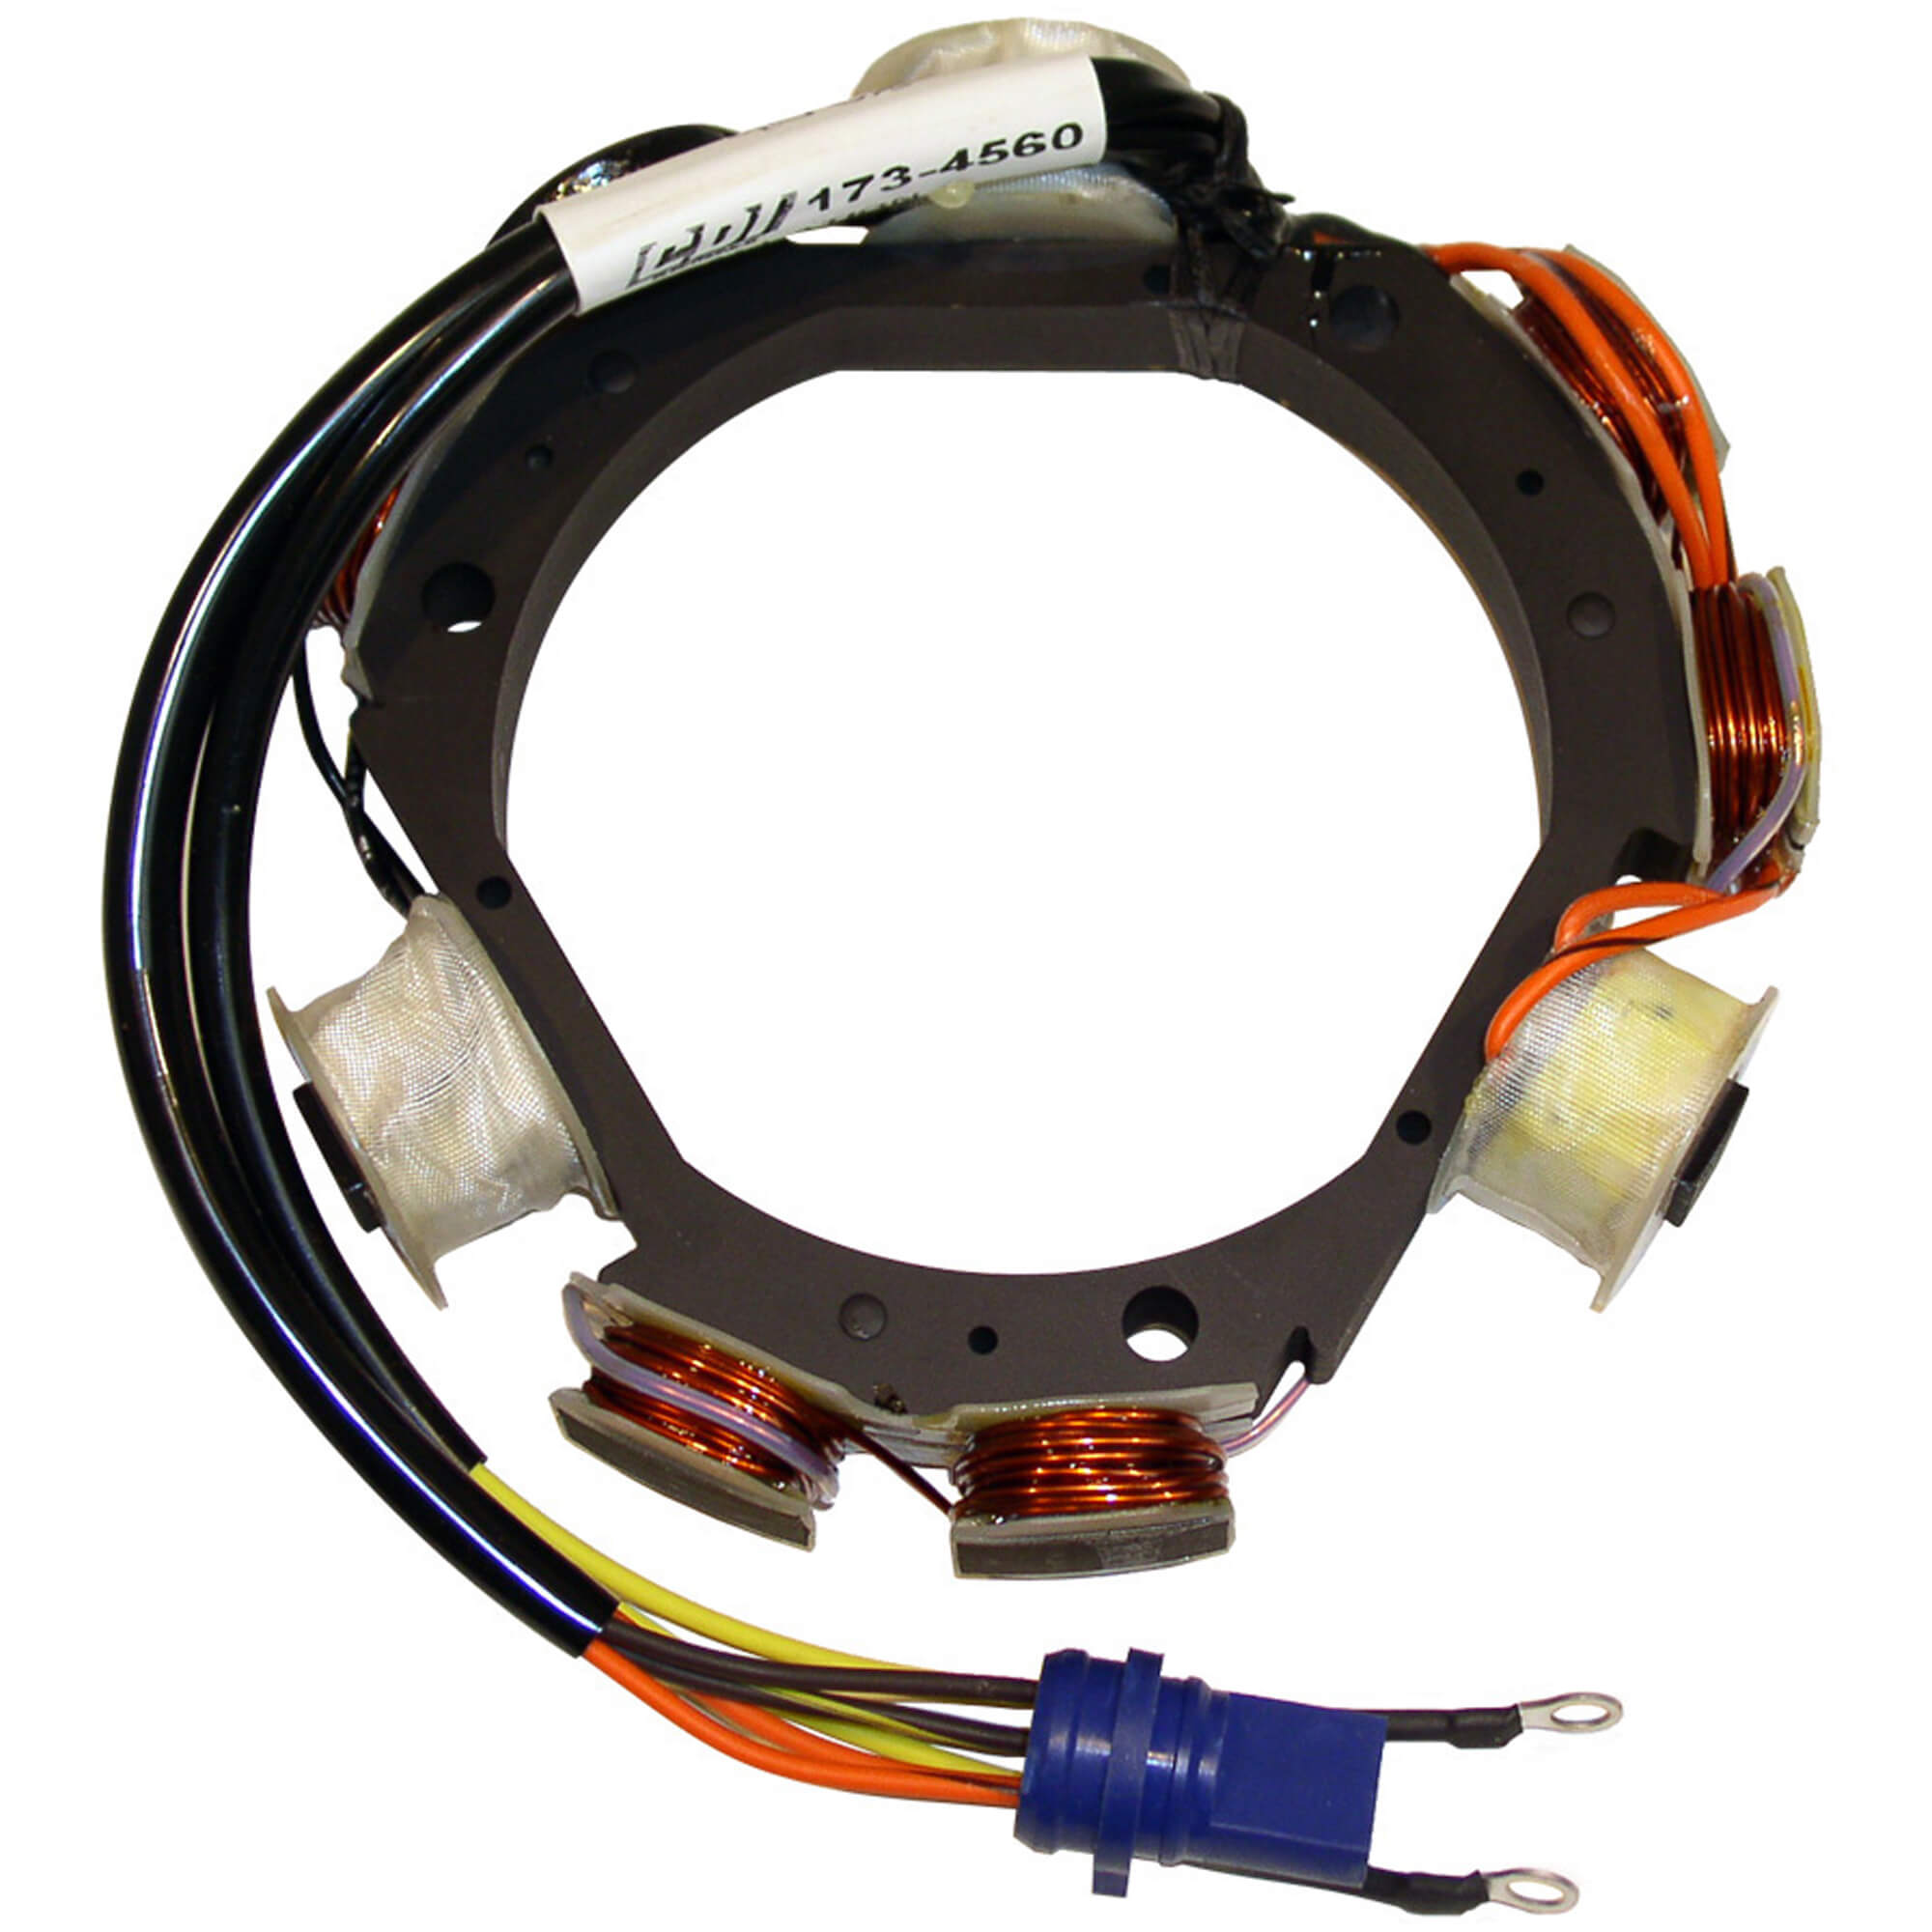 2 Cyl. 173-1232 6 Amp CDI 173-1232 Johnson Evinrude Stator